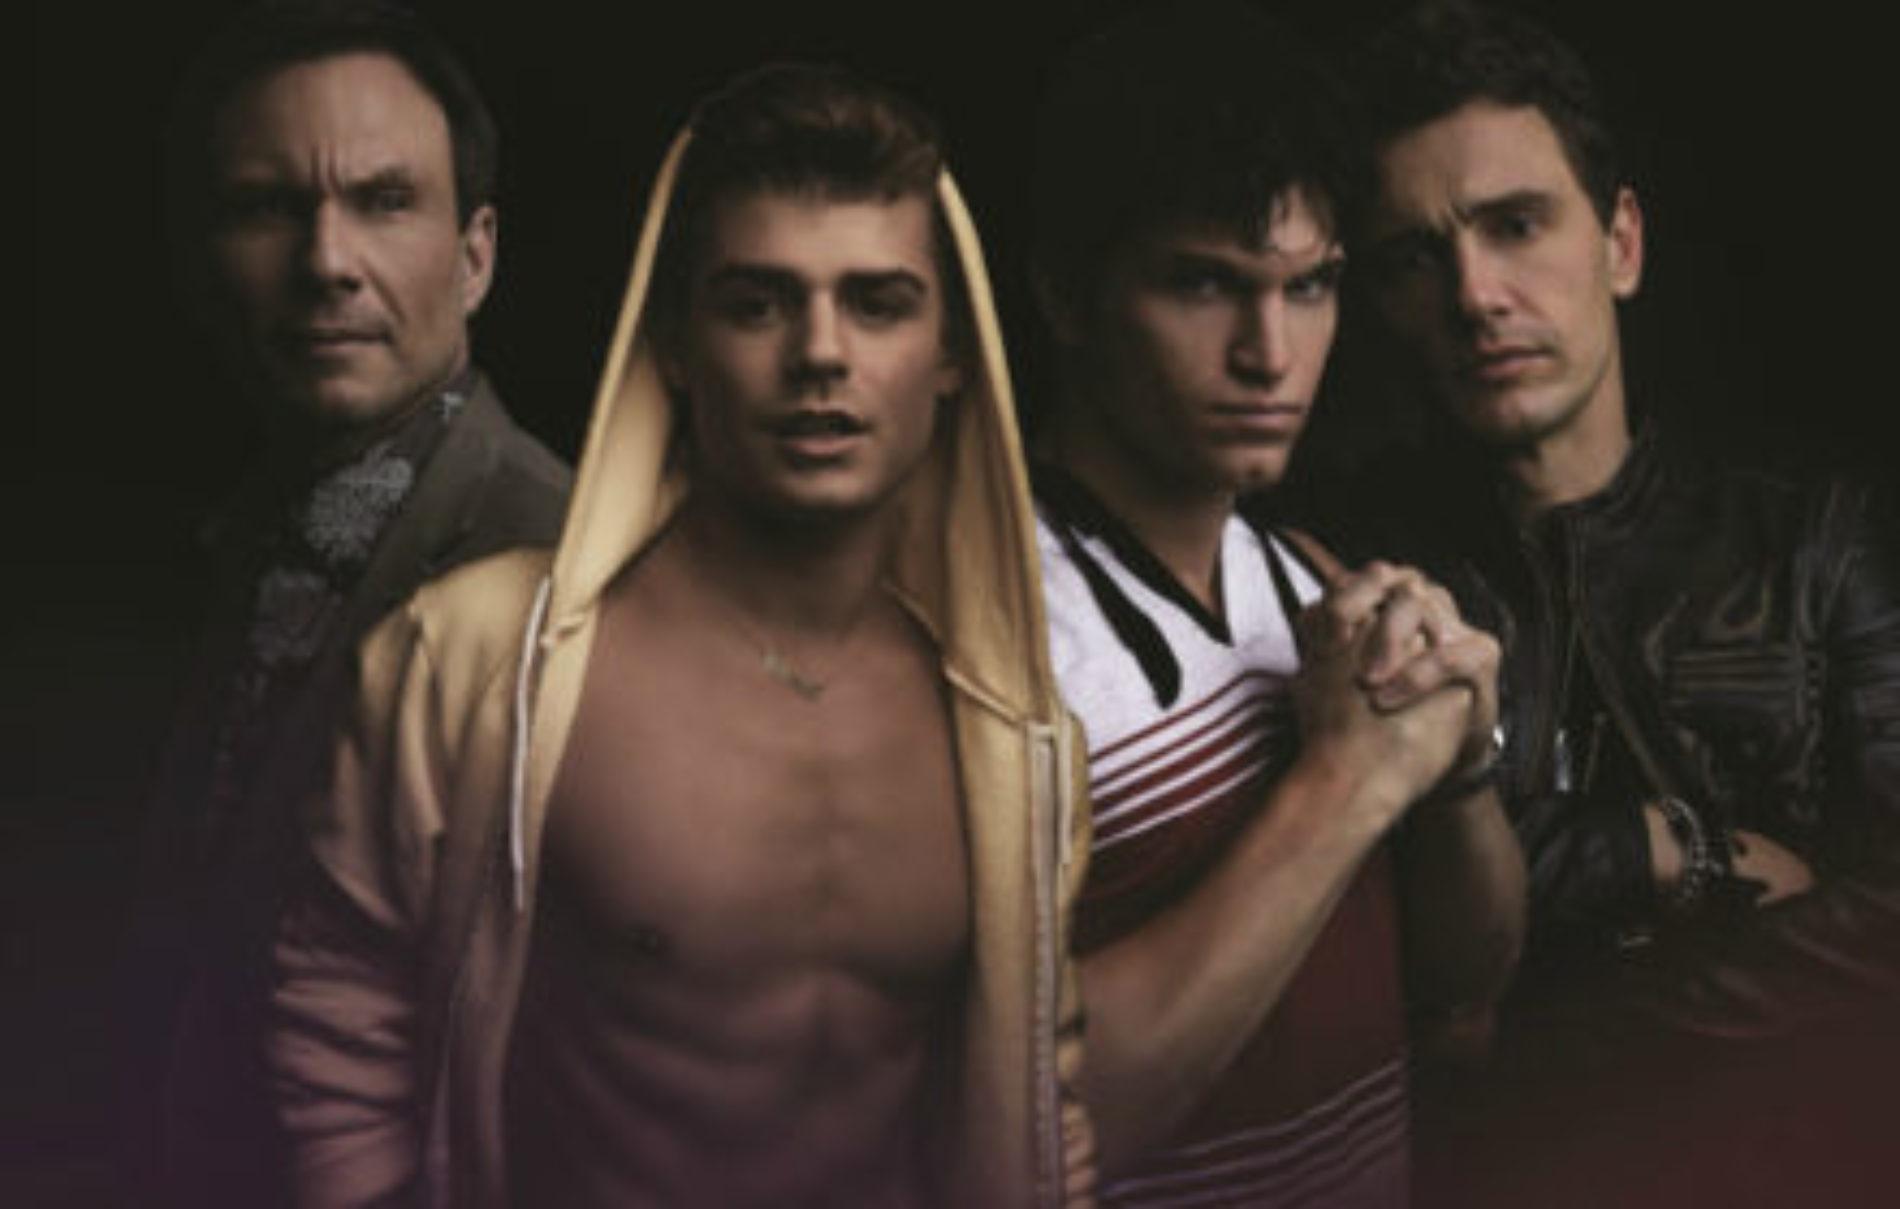 Brent Corrigan Thinks James Franco's 'King Cobra' Demonstrates Contempt For Queer Culture